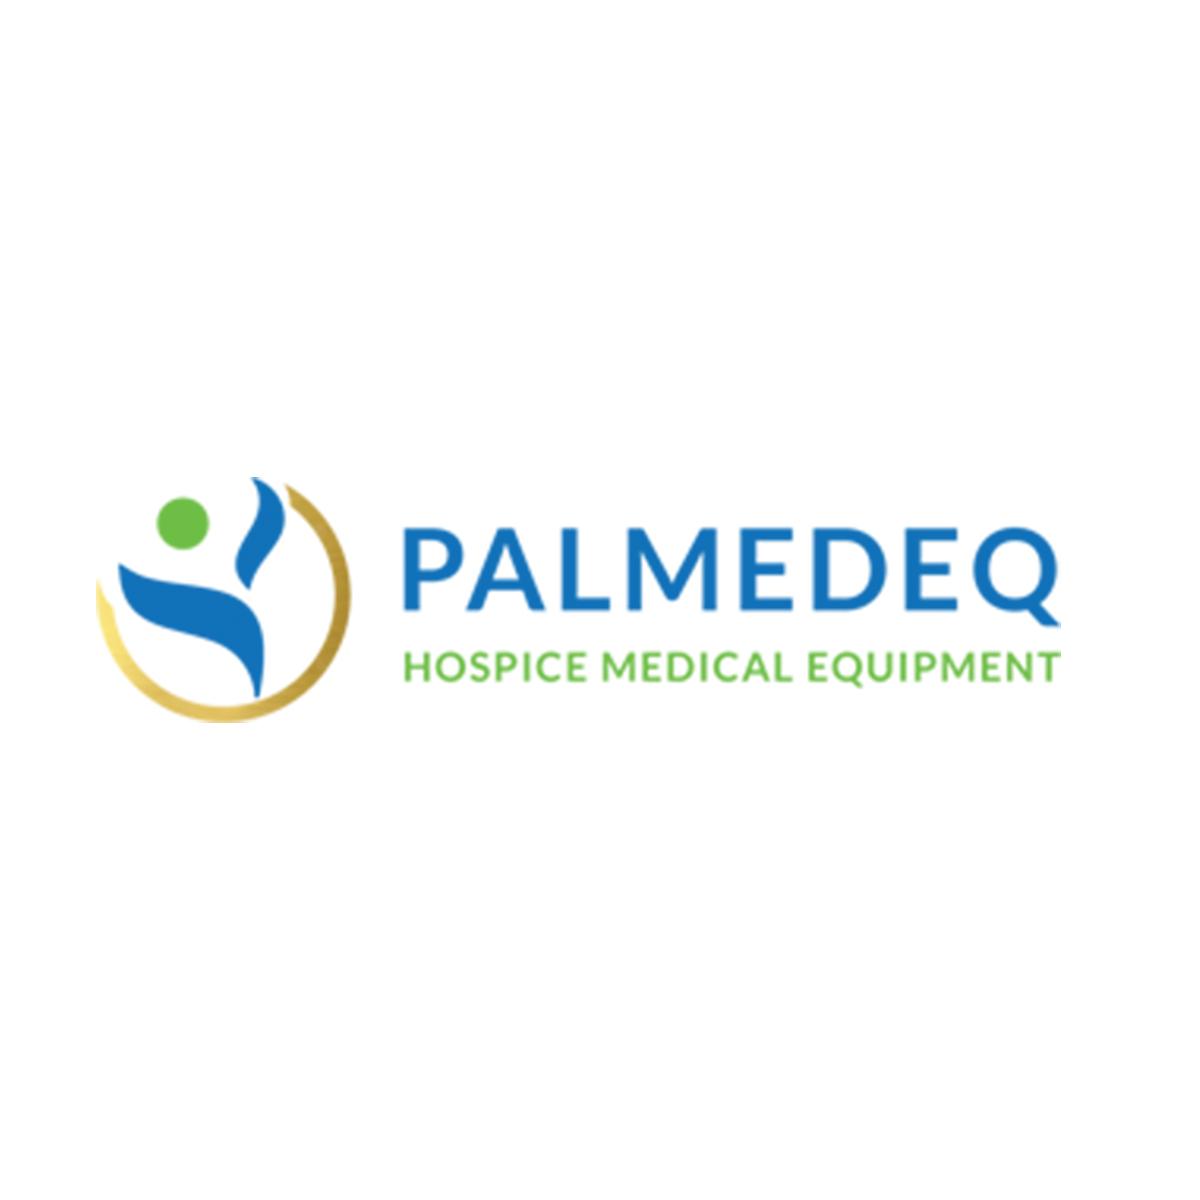 Palmedeq